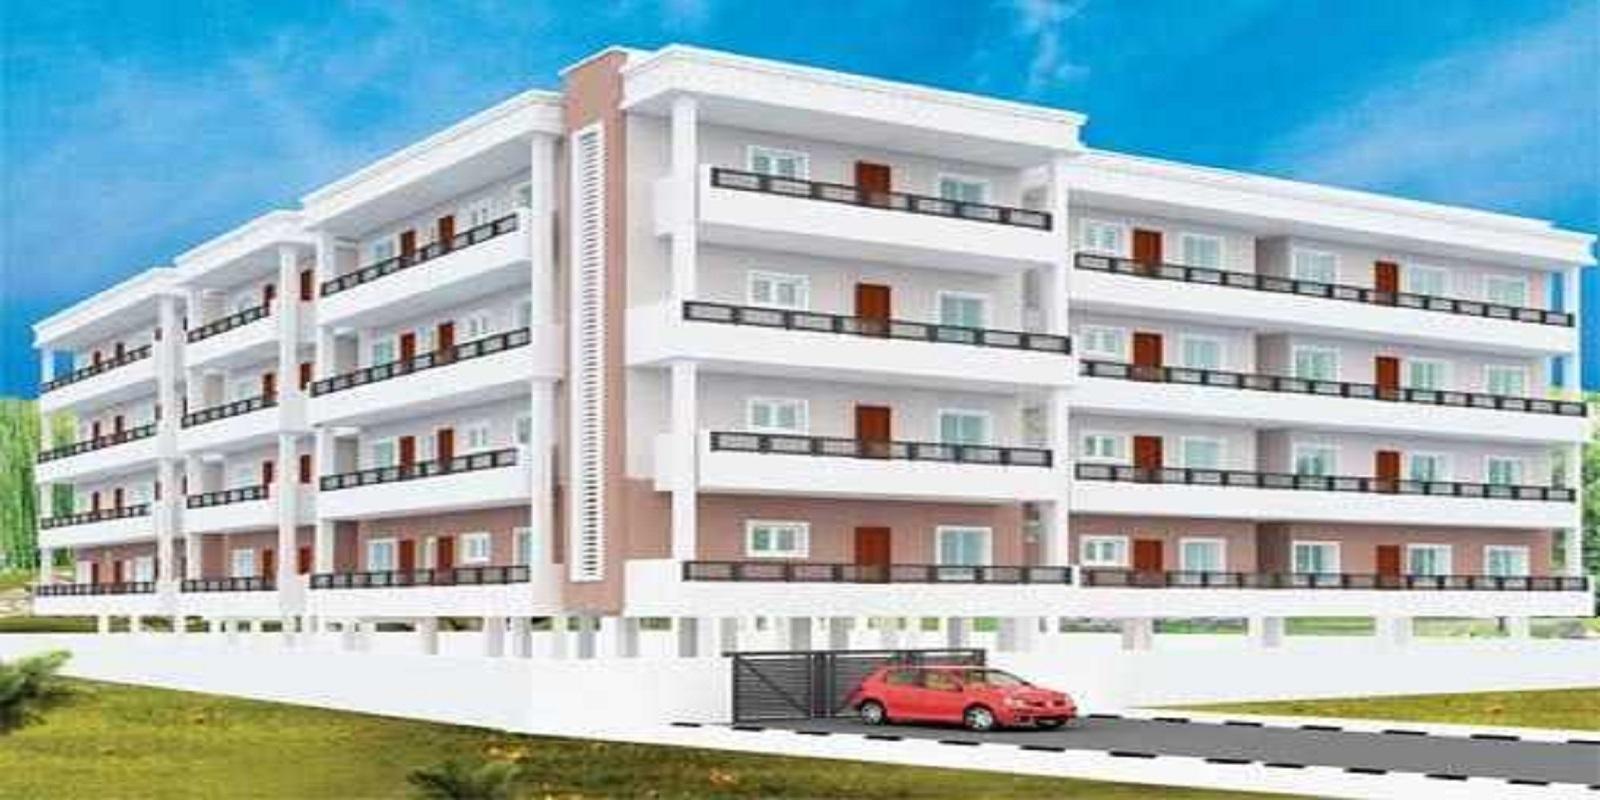 arvinds arkavathi project project thumbnail image1